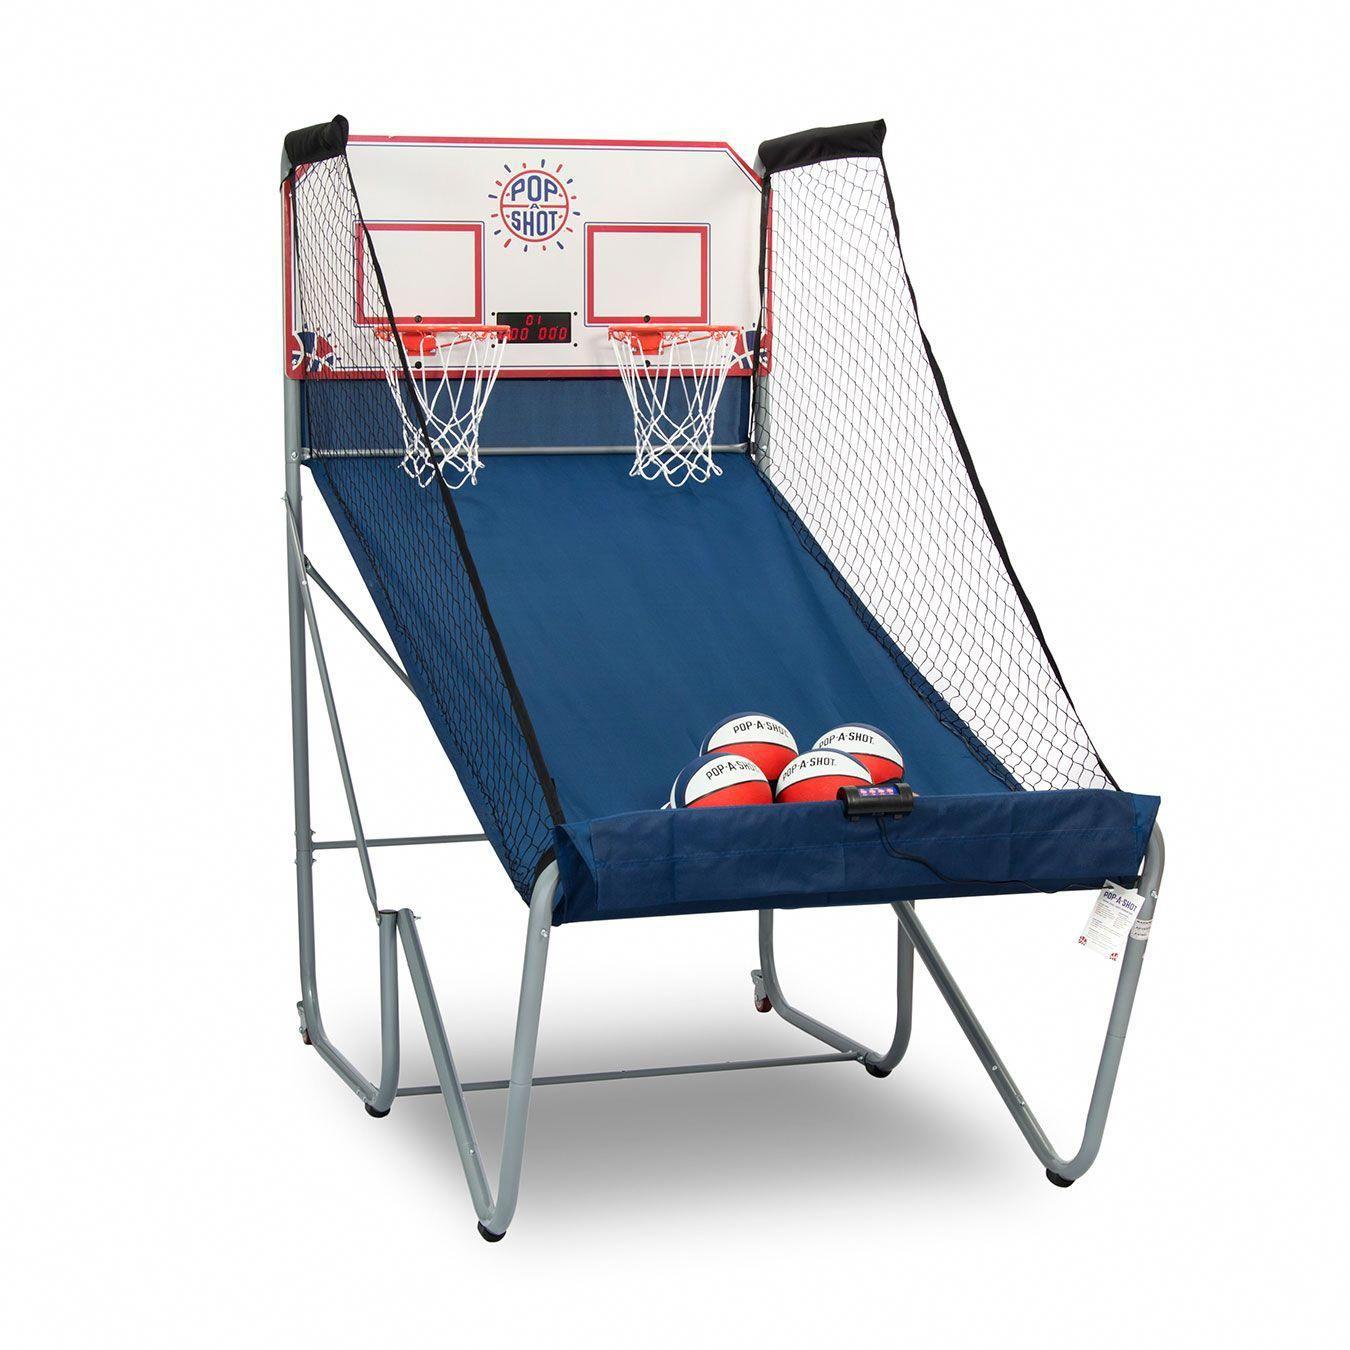 Basketball Games Unblocked SecondHandBasketballHoops